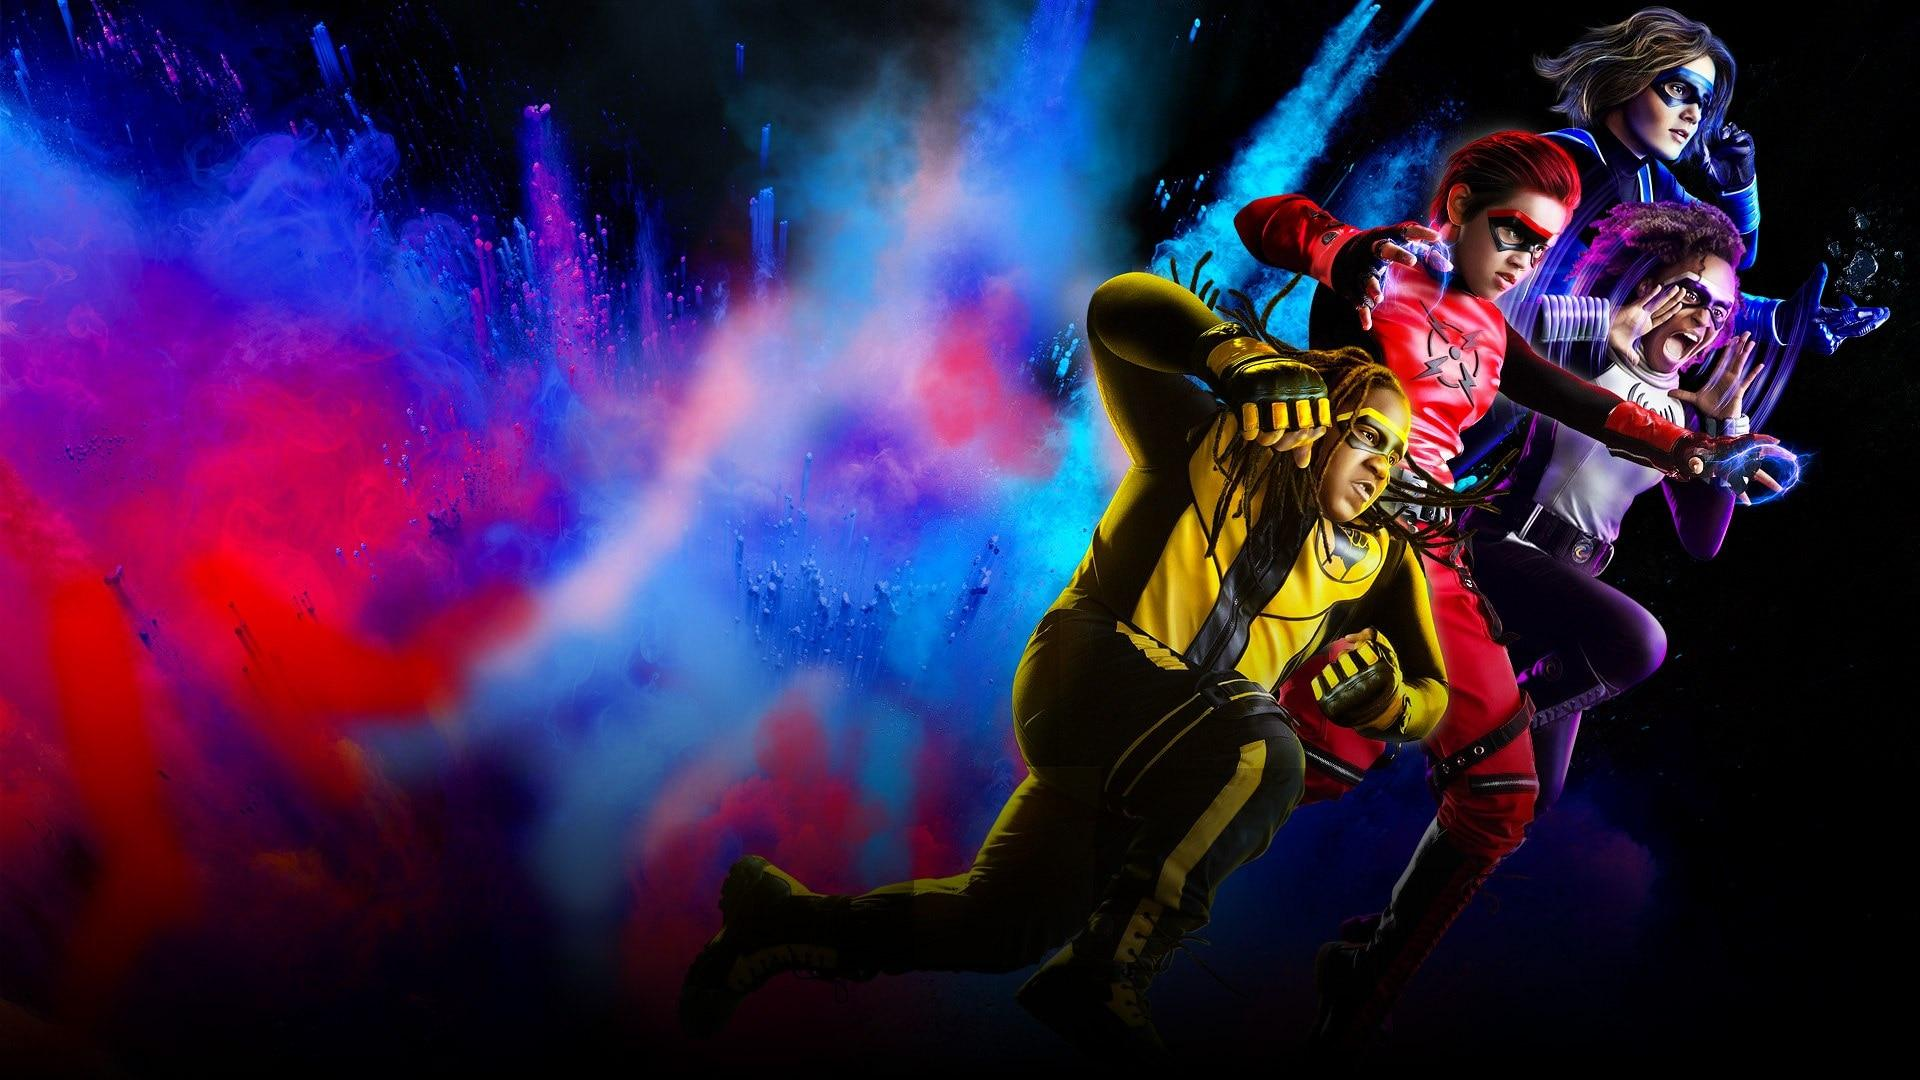 Nickelodeon +1 Danger Force